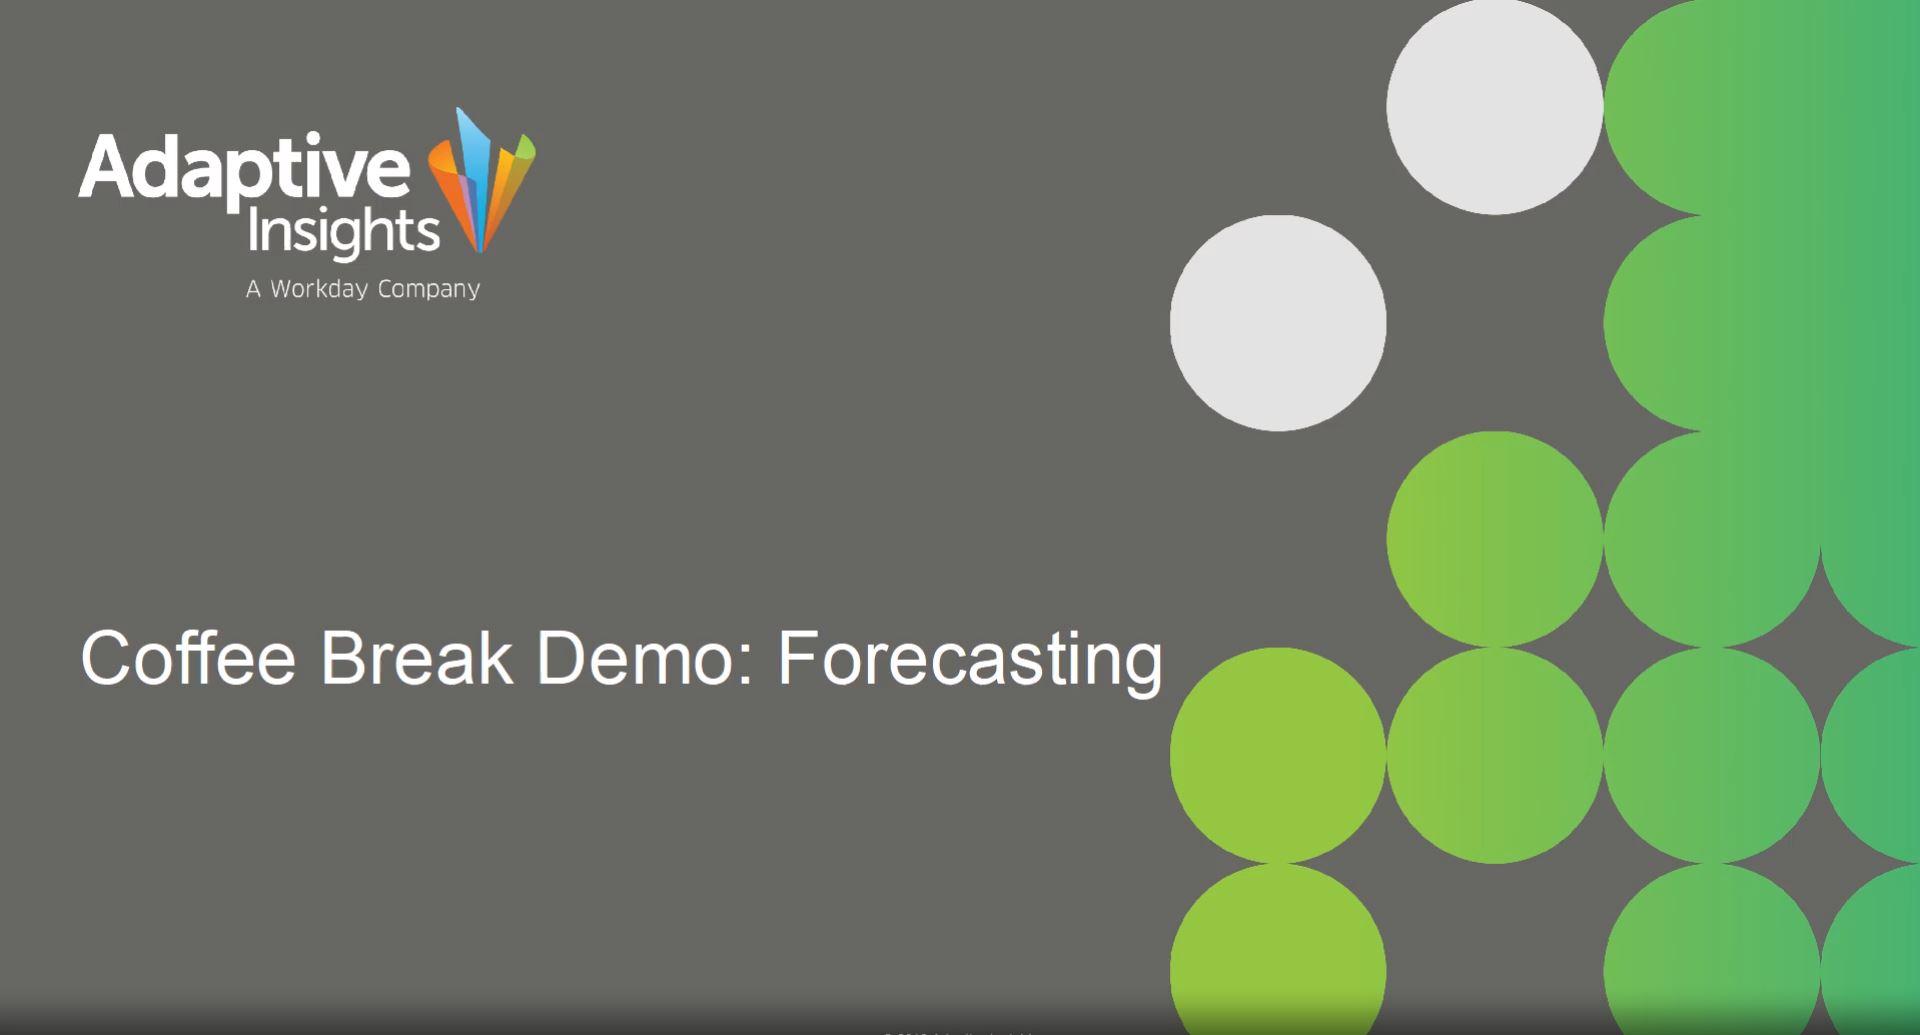 Coffee Break Demo - Forecasting